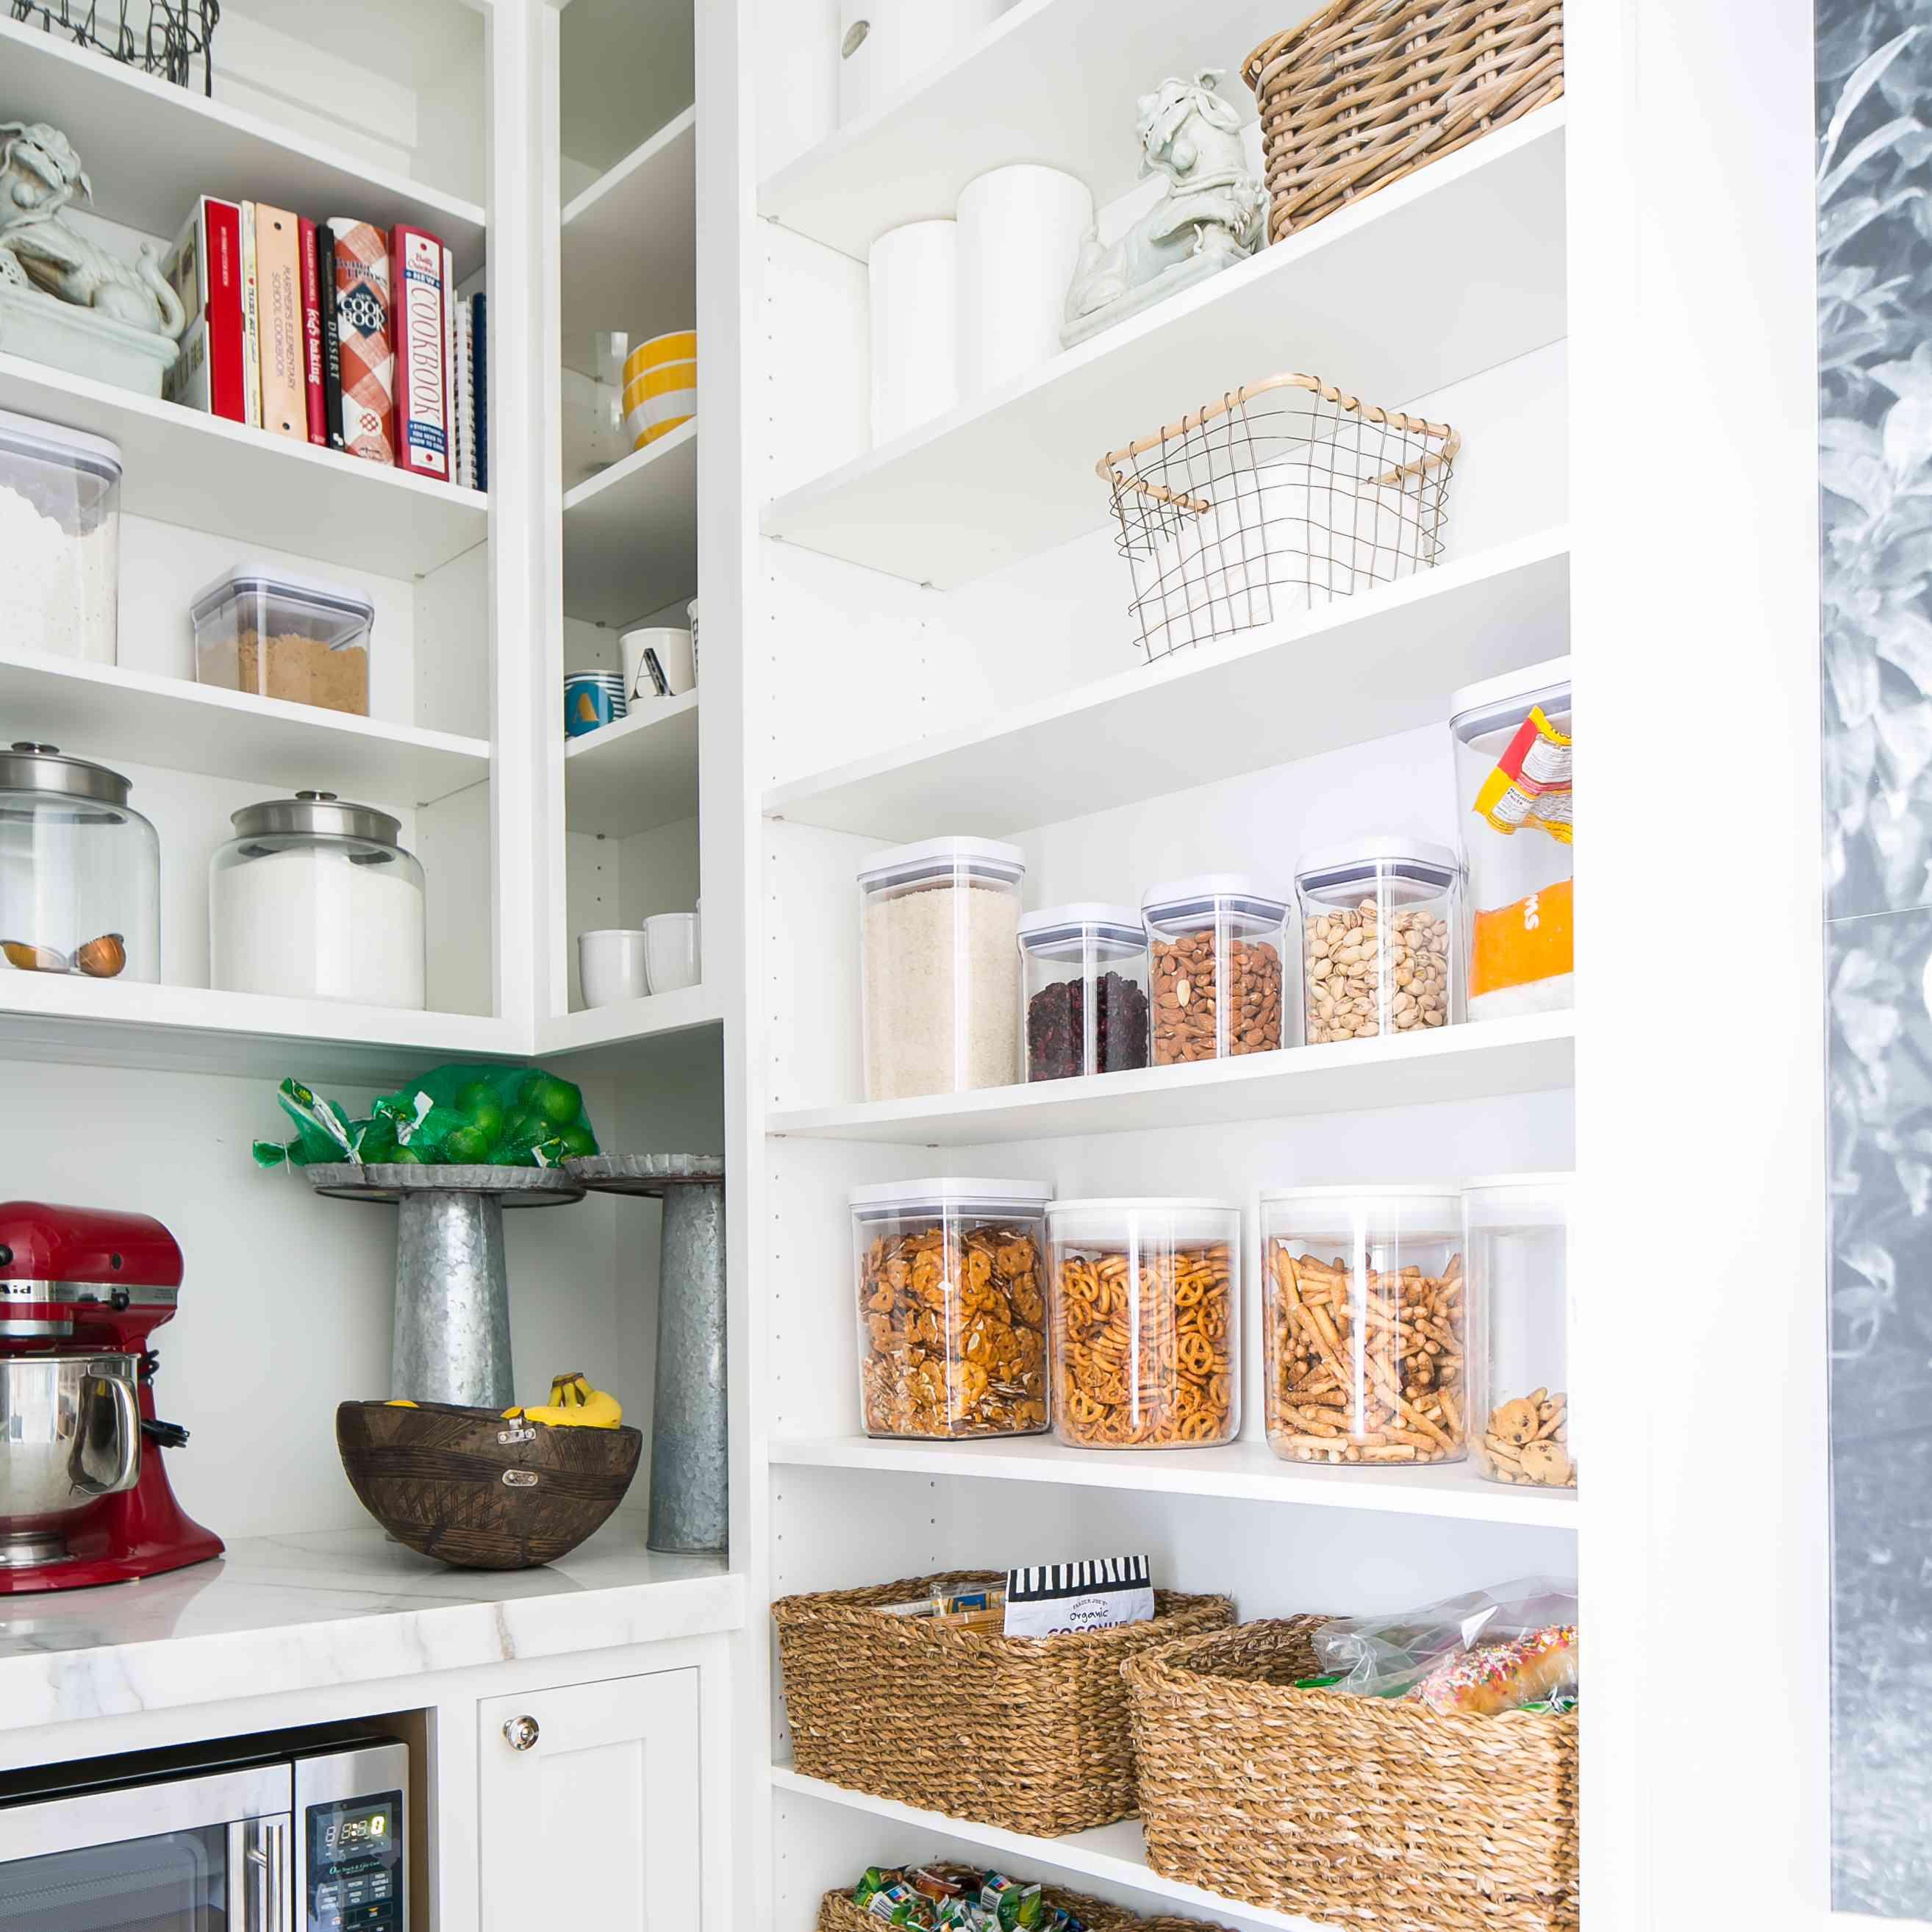 11 Kitchen Storage Ideas That Make It Impossible To Be Disorganized